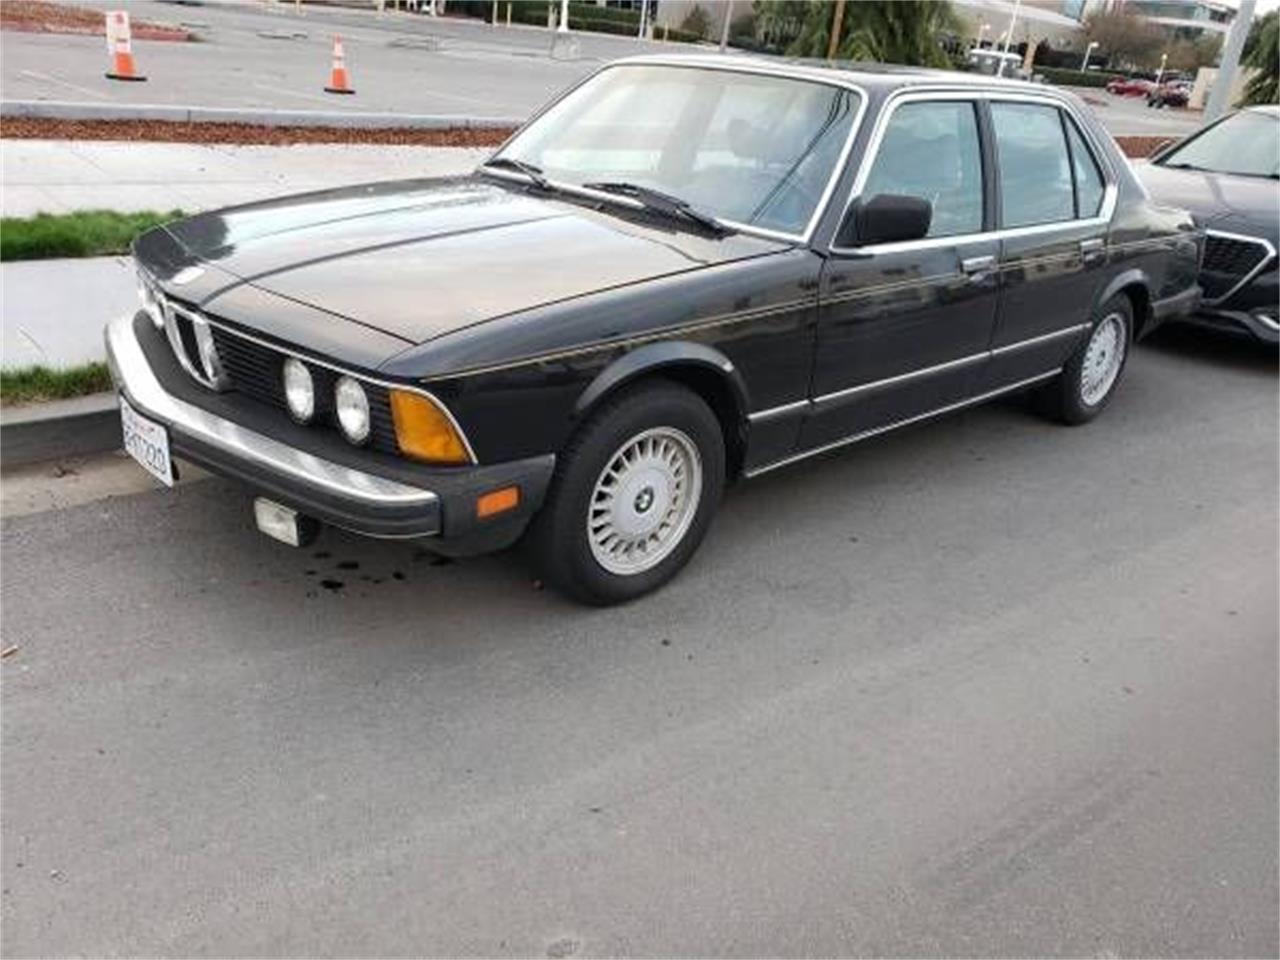 for sale 1987 bmw 7 series in cadillac, michigan cars - cadillac, mi at geebo